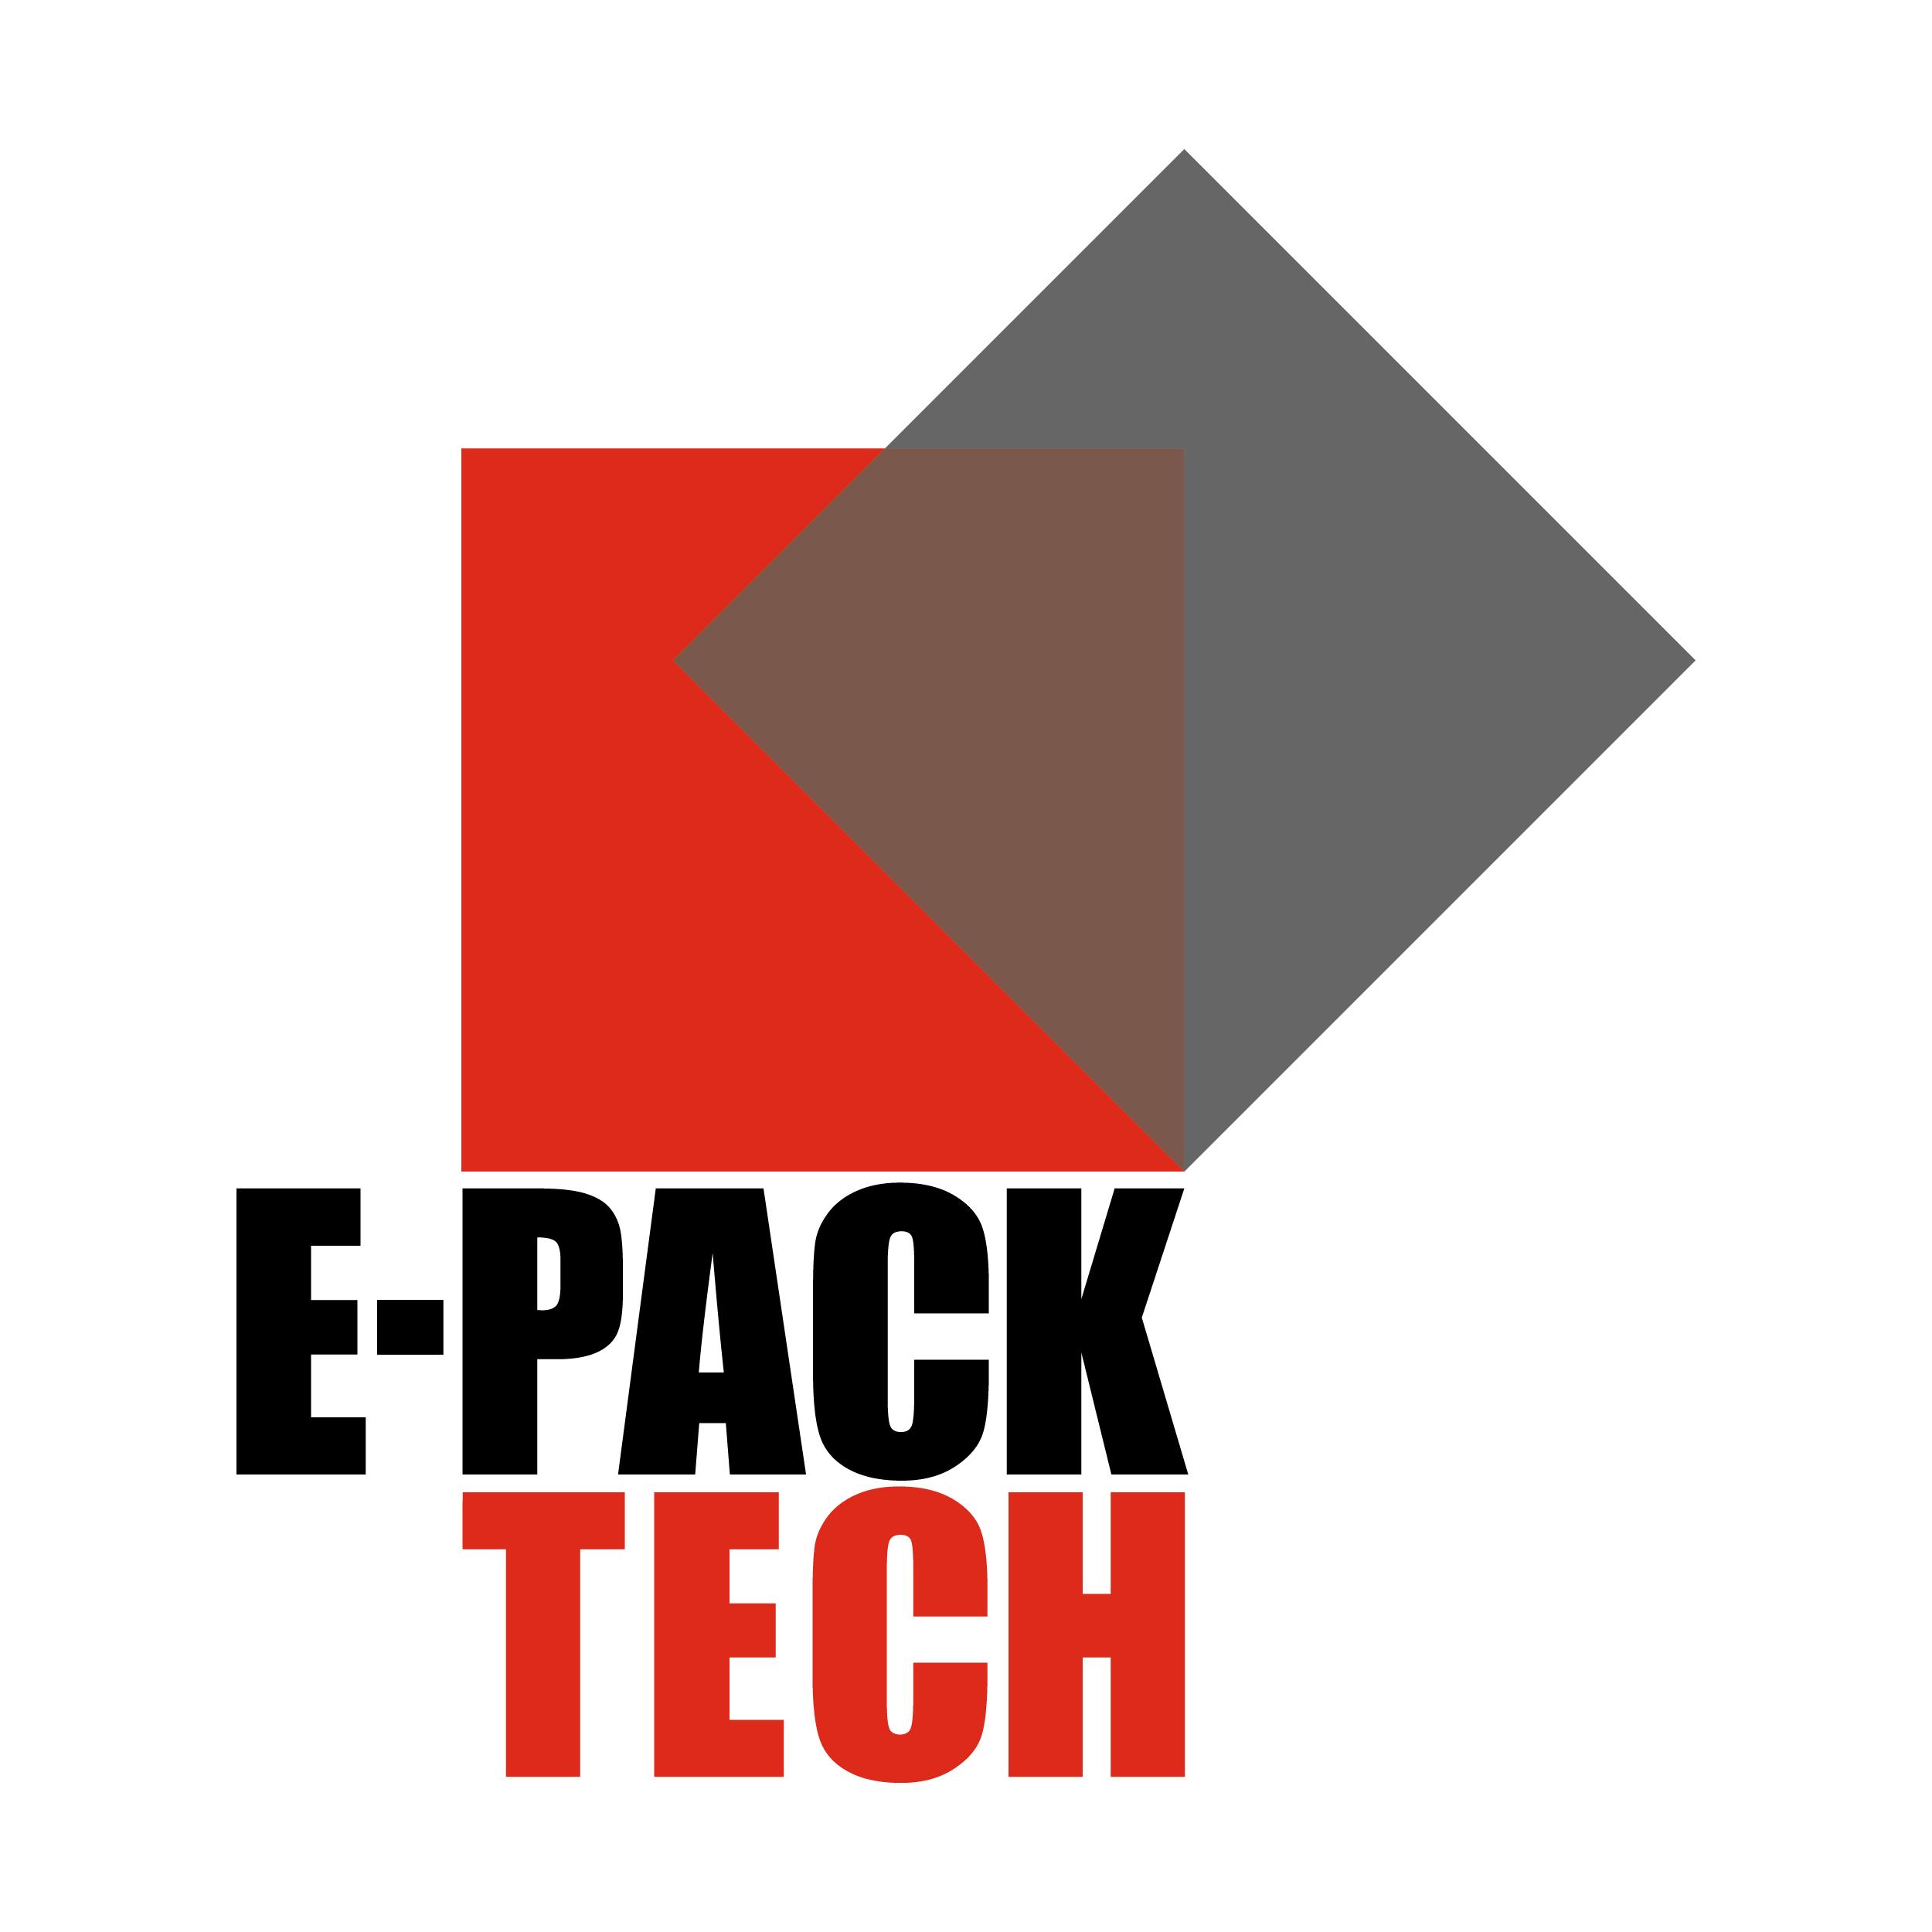 E PACK TECH.jpg